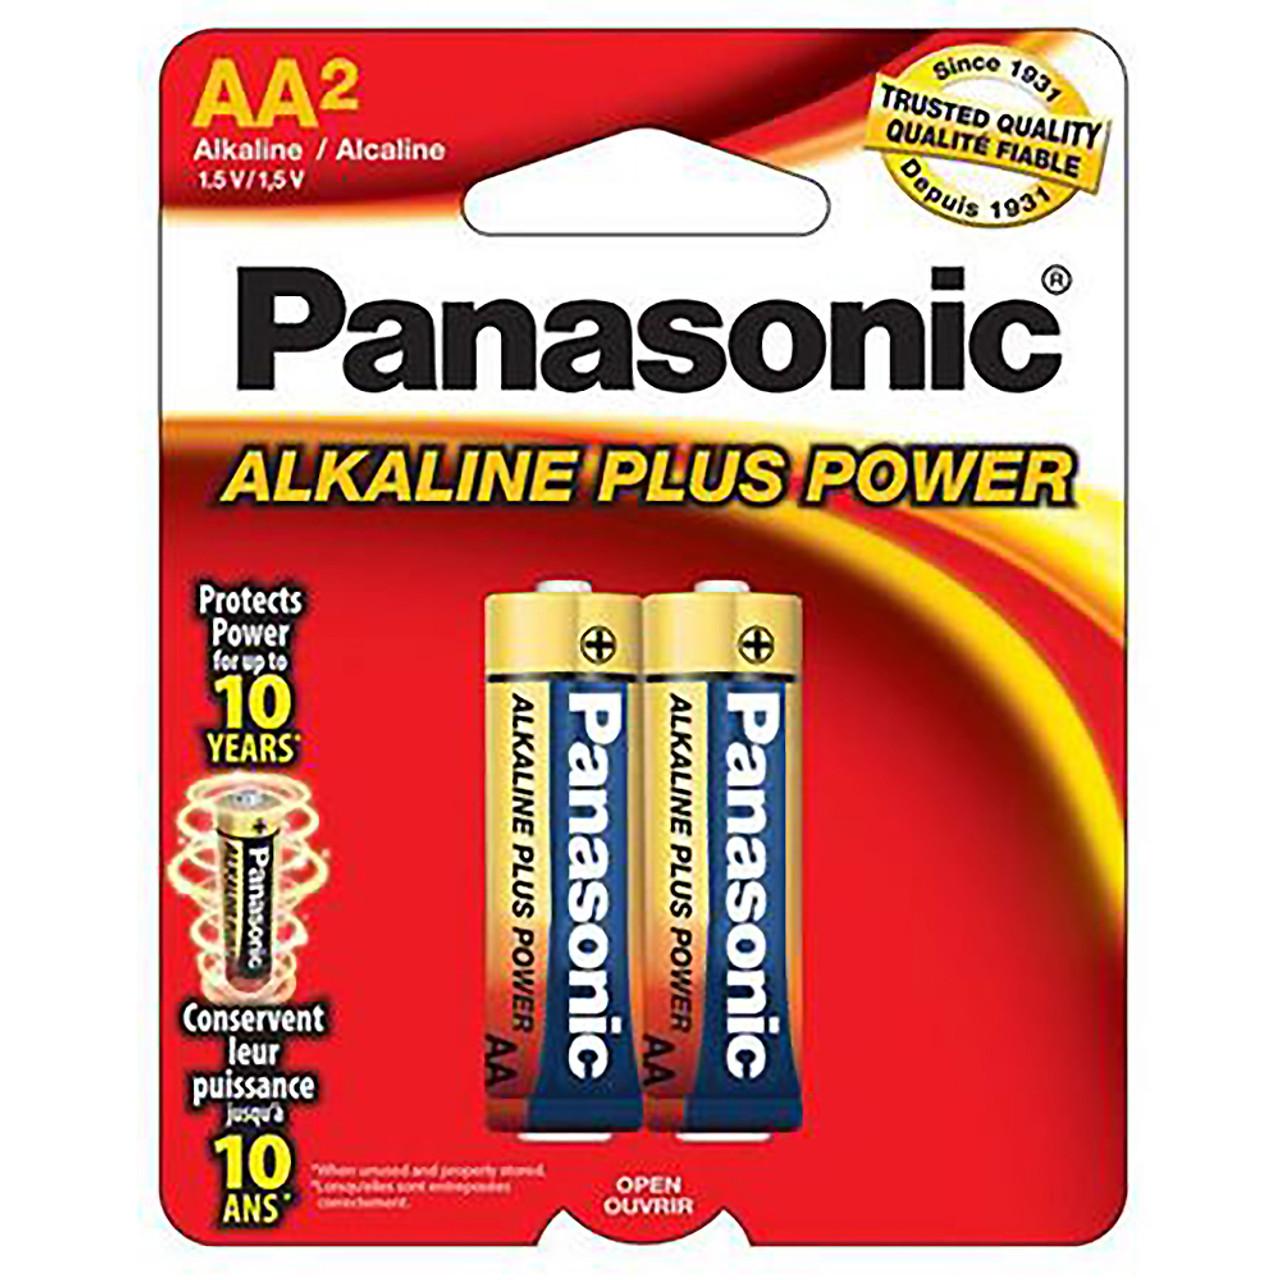 PANASONIC AA ALKALINE BATTERY (2 PK)